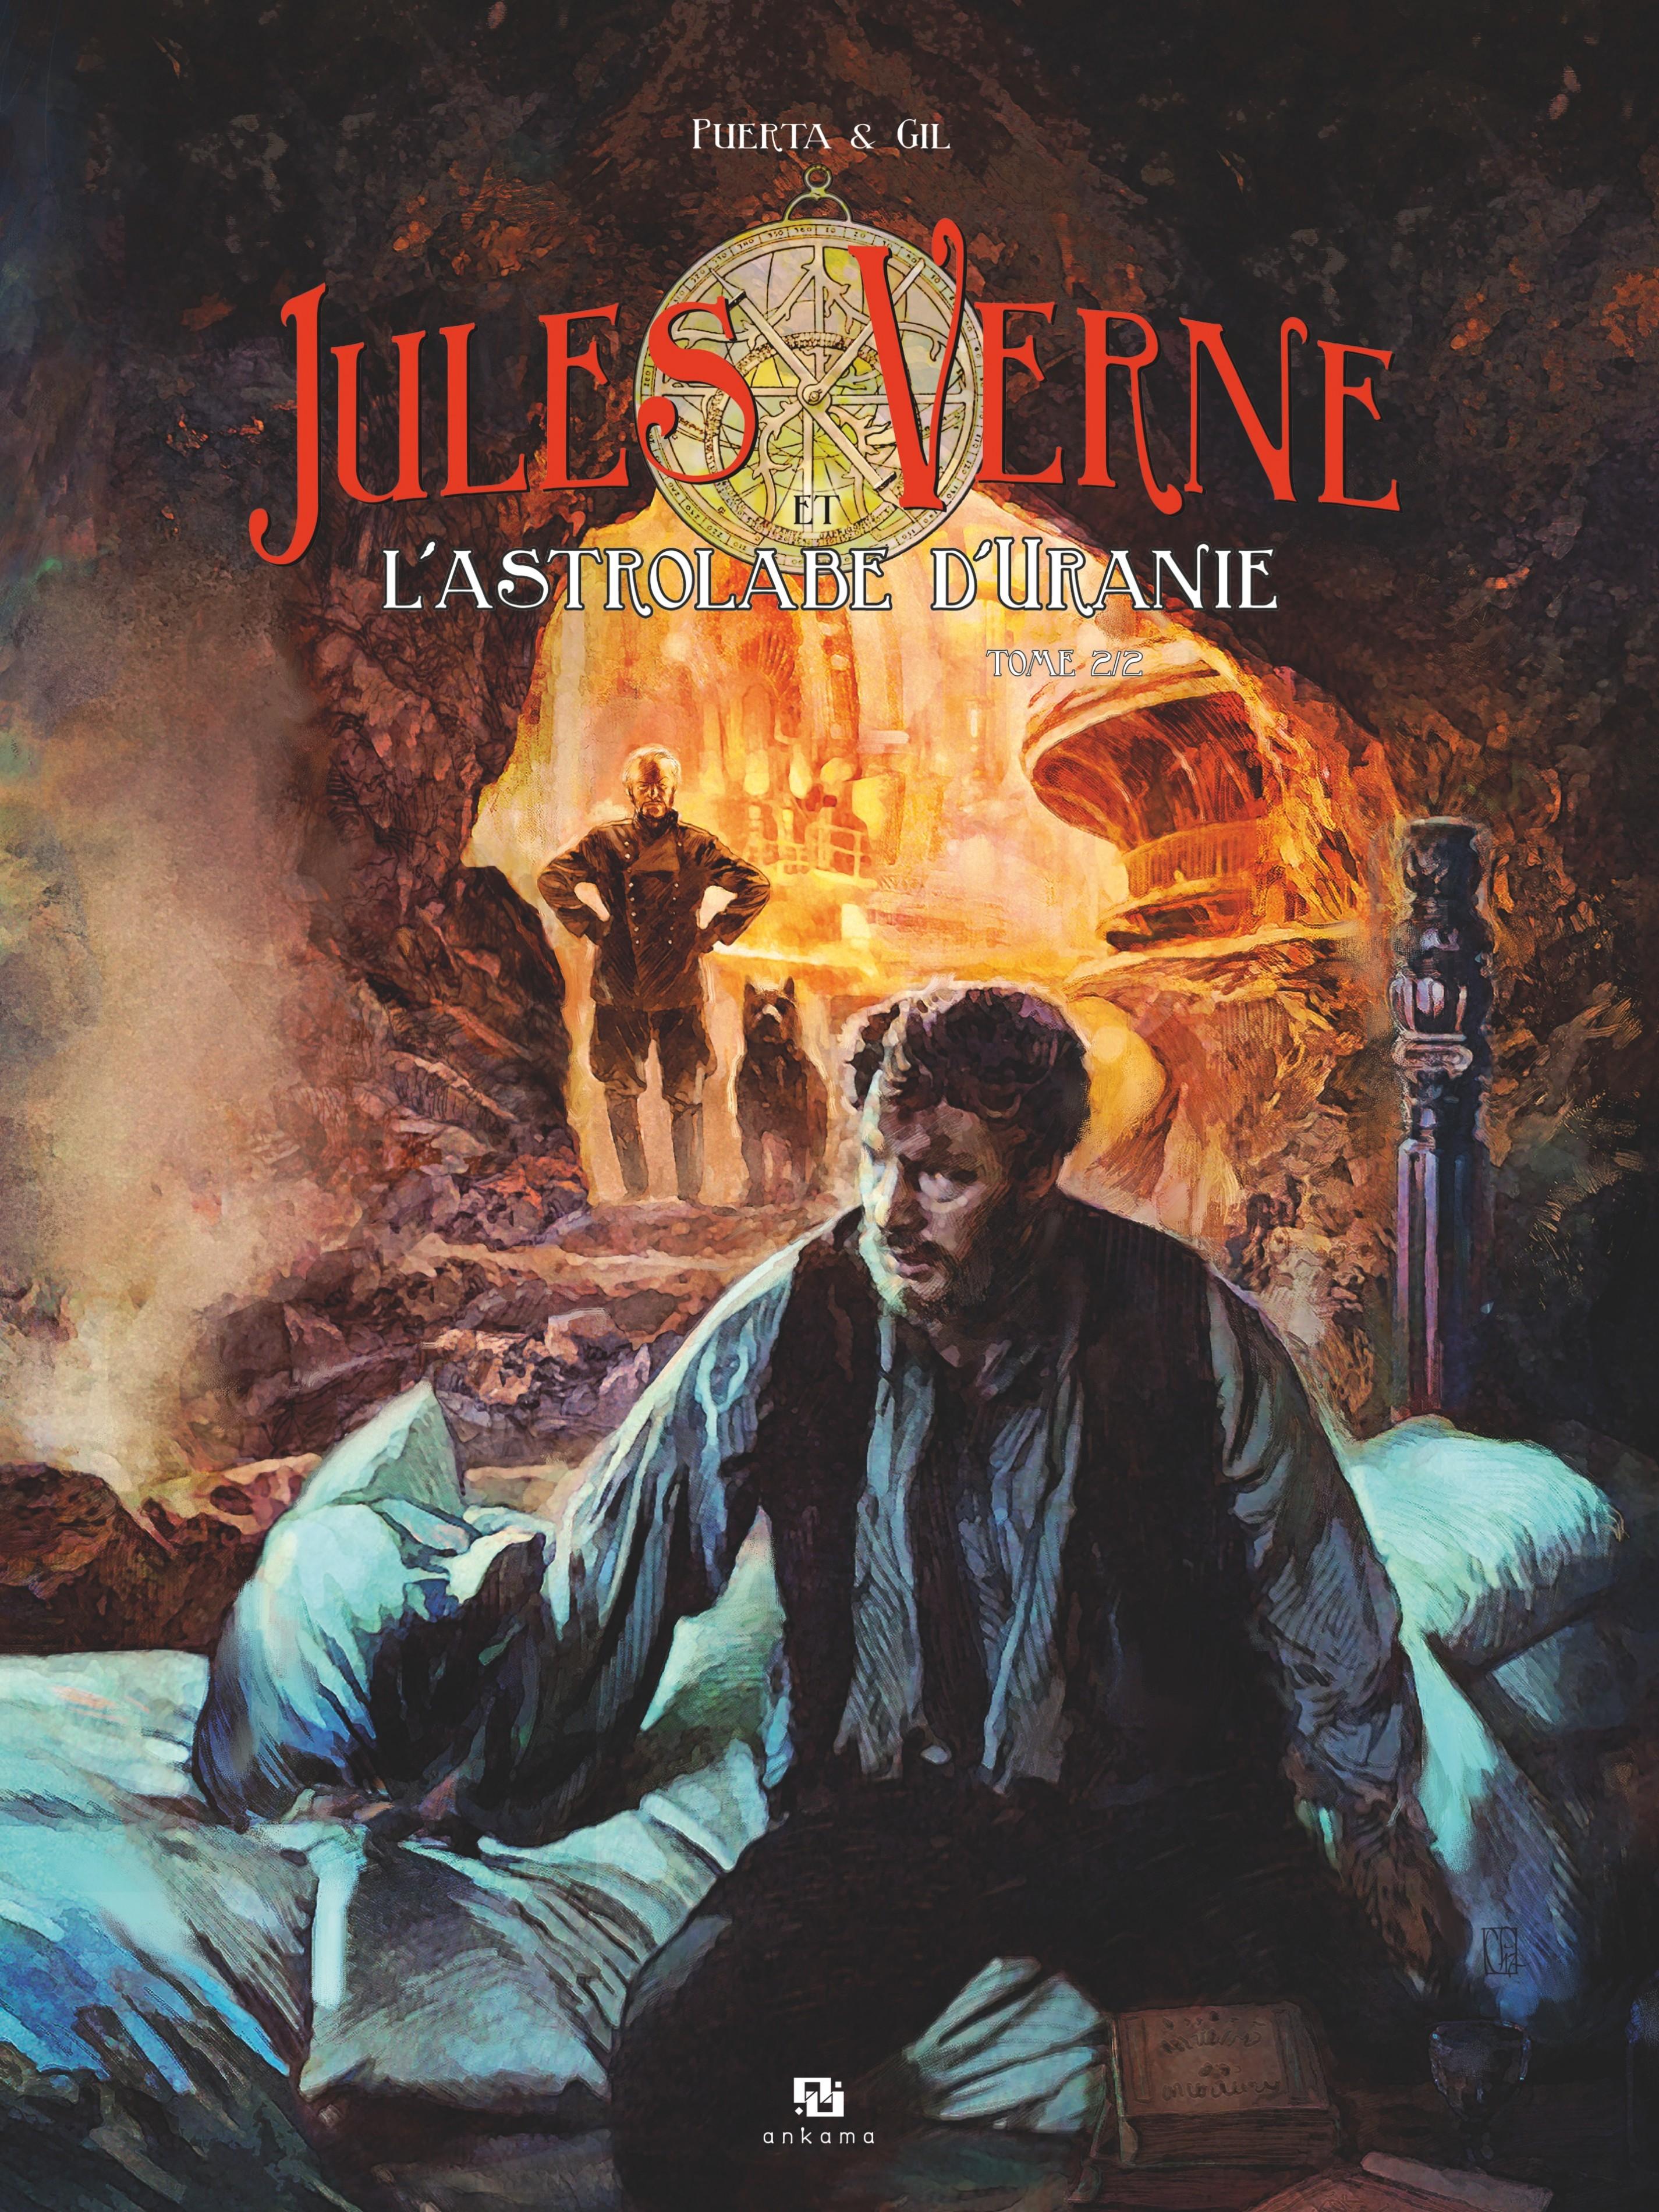 Jules Verne et l'Astrolabe d'Uranie - Tome 2 - Jules Verne et l'Astrolabe d'Uranie - Tome 2